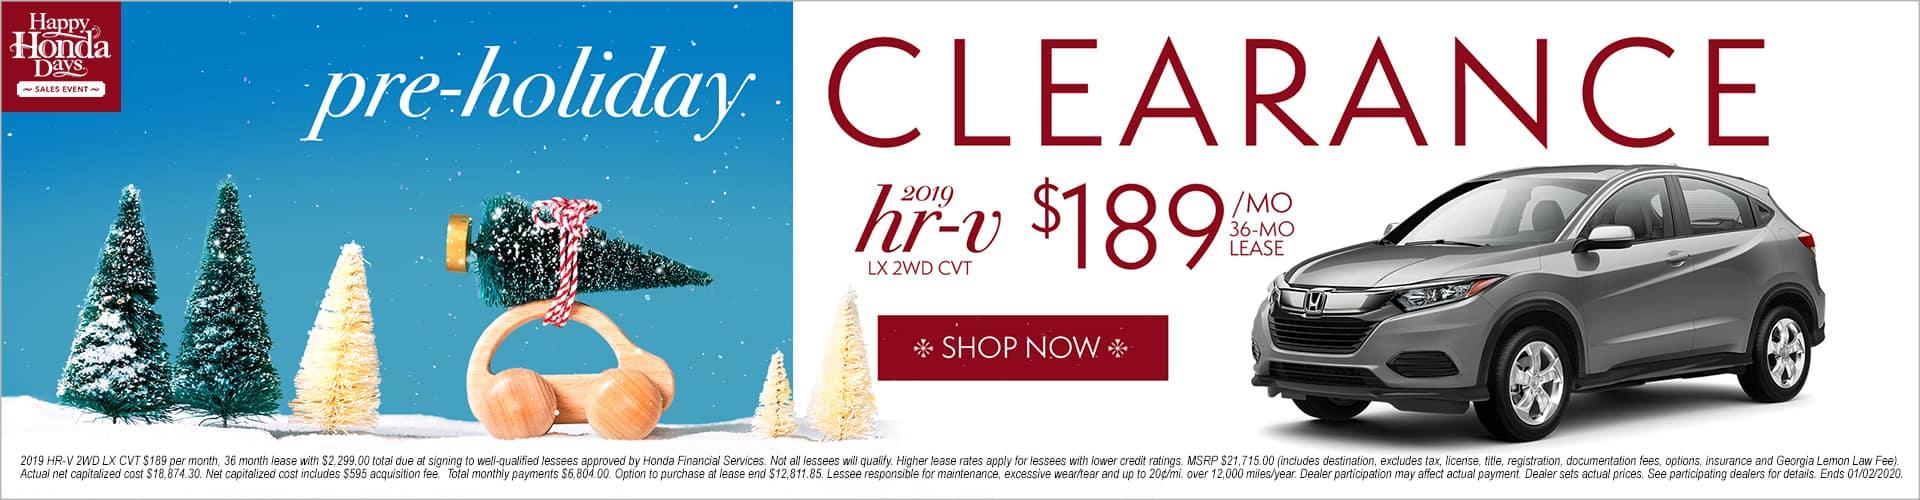 Happy Honda Days Honda HR-V HRV Pre Holiday Clearance Lease LX 2WD Phil Hughes Honda Athens GA